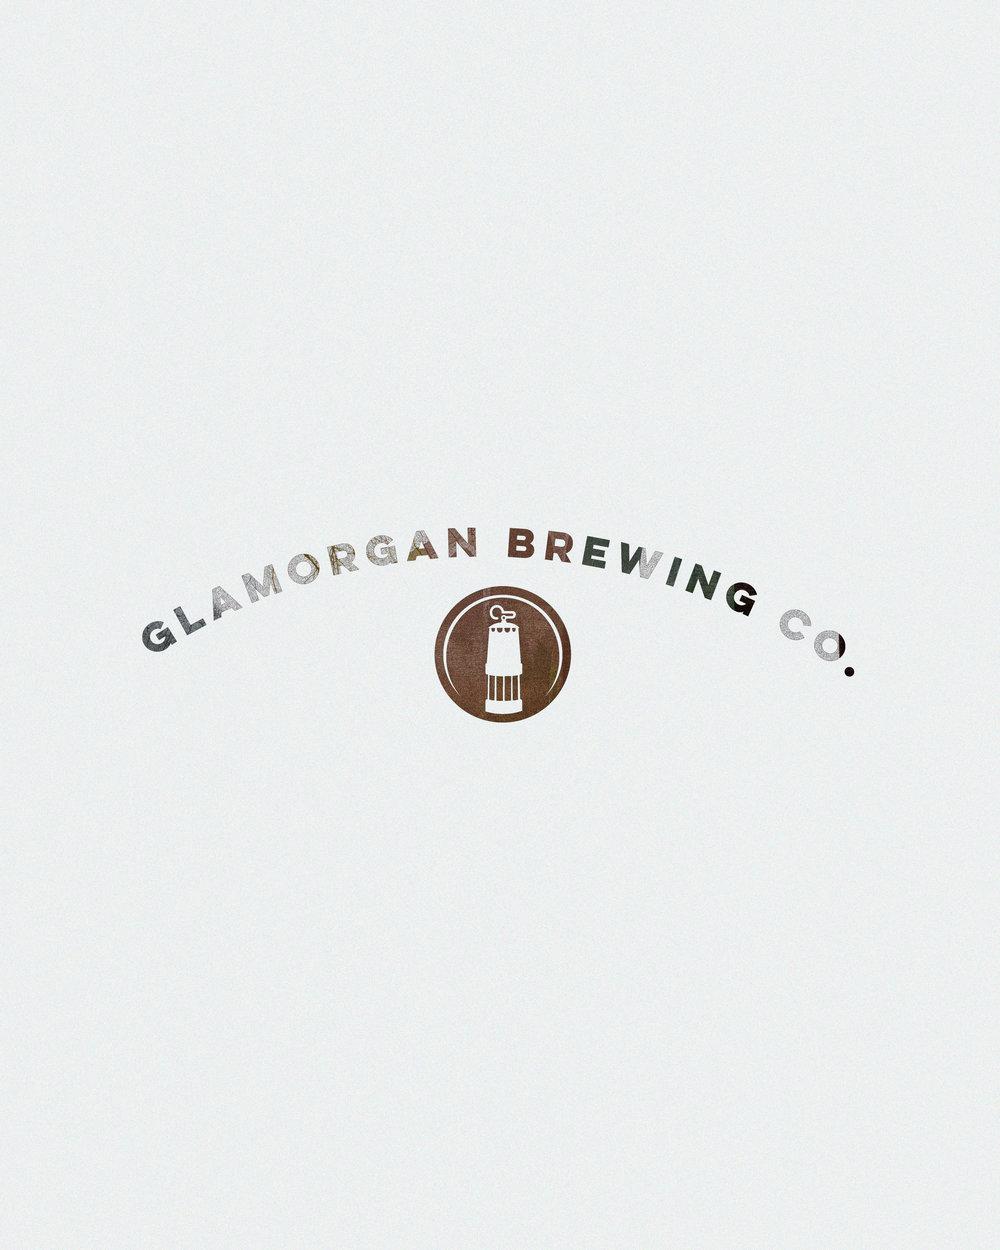 Glamorgan_Brewing_Logo.jpg